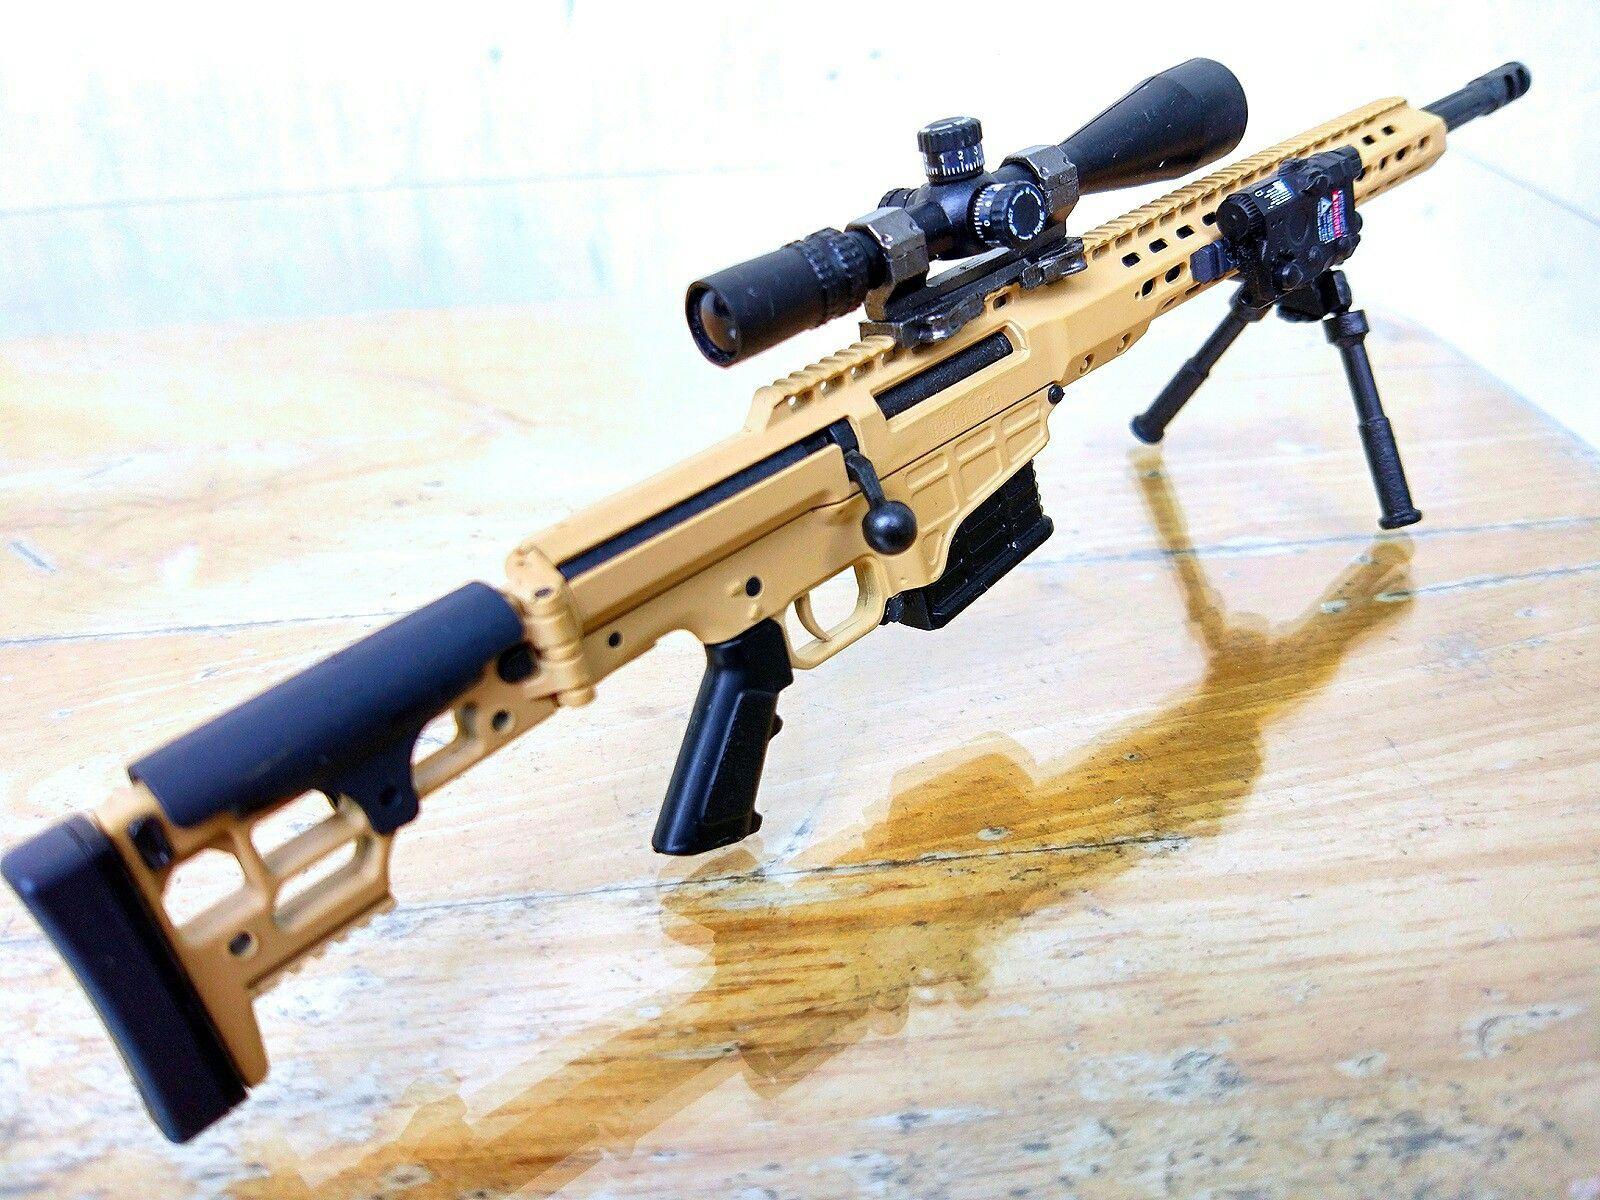 Armslist for sale barrett mrad 338 lapua 308 win 300 mag layaway -  Barrett Mrad Missionspecificequipment Msedevgru Easy Simple Actionfigure Barrett Mrad Rifle By